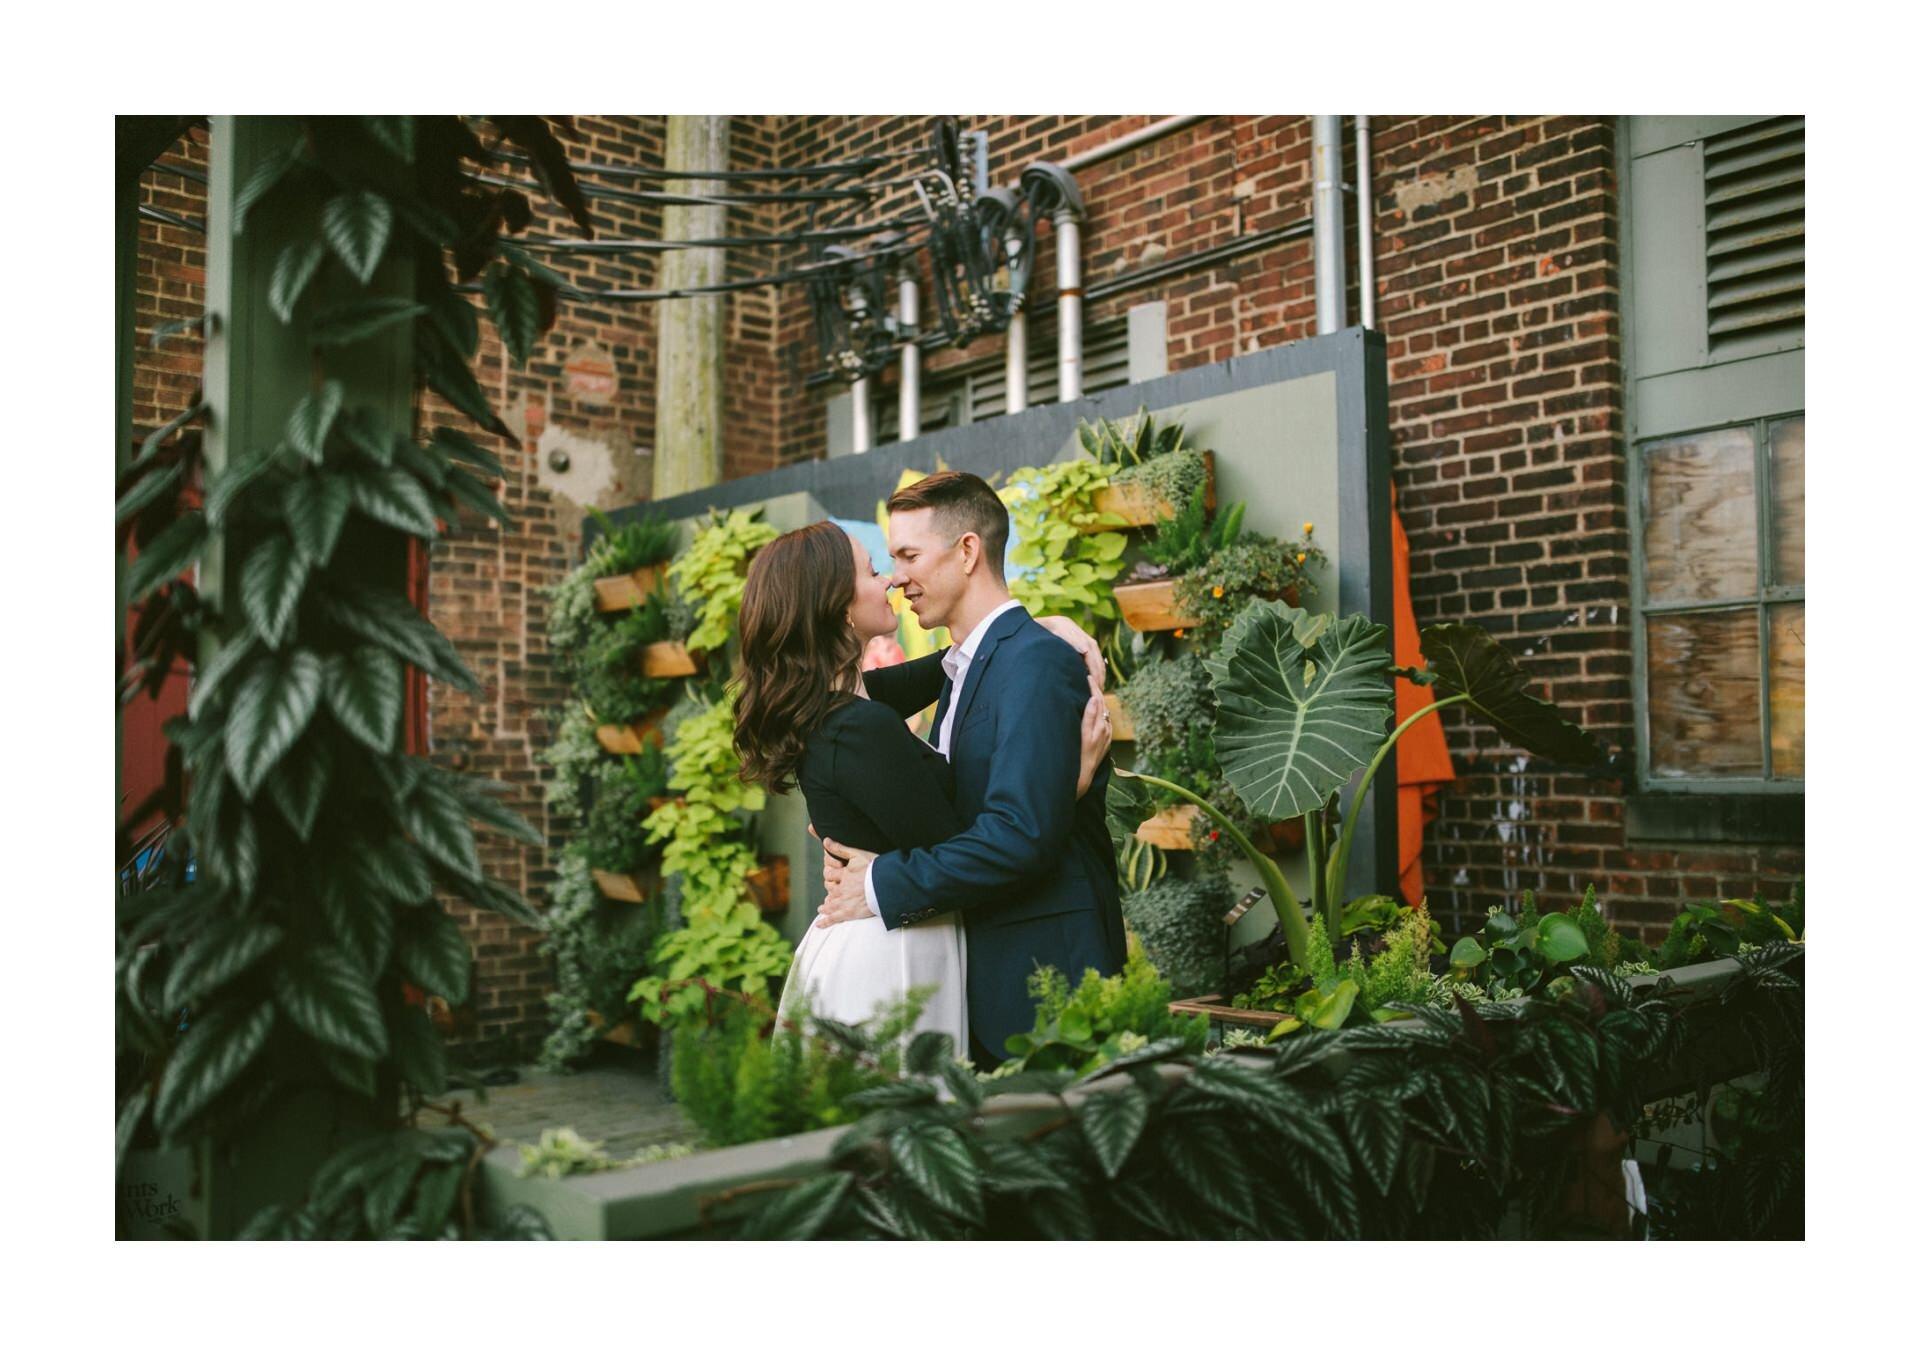 78th Street Studio Engagement and Wedding Photographer 12.jpg